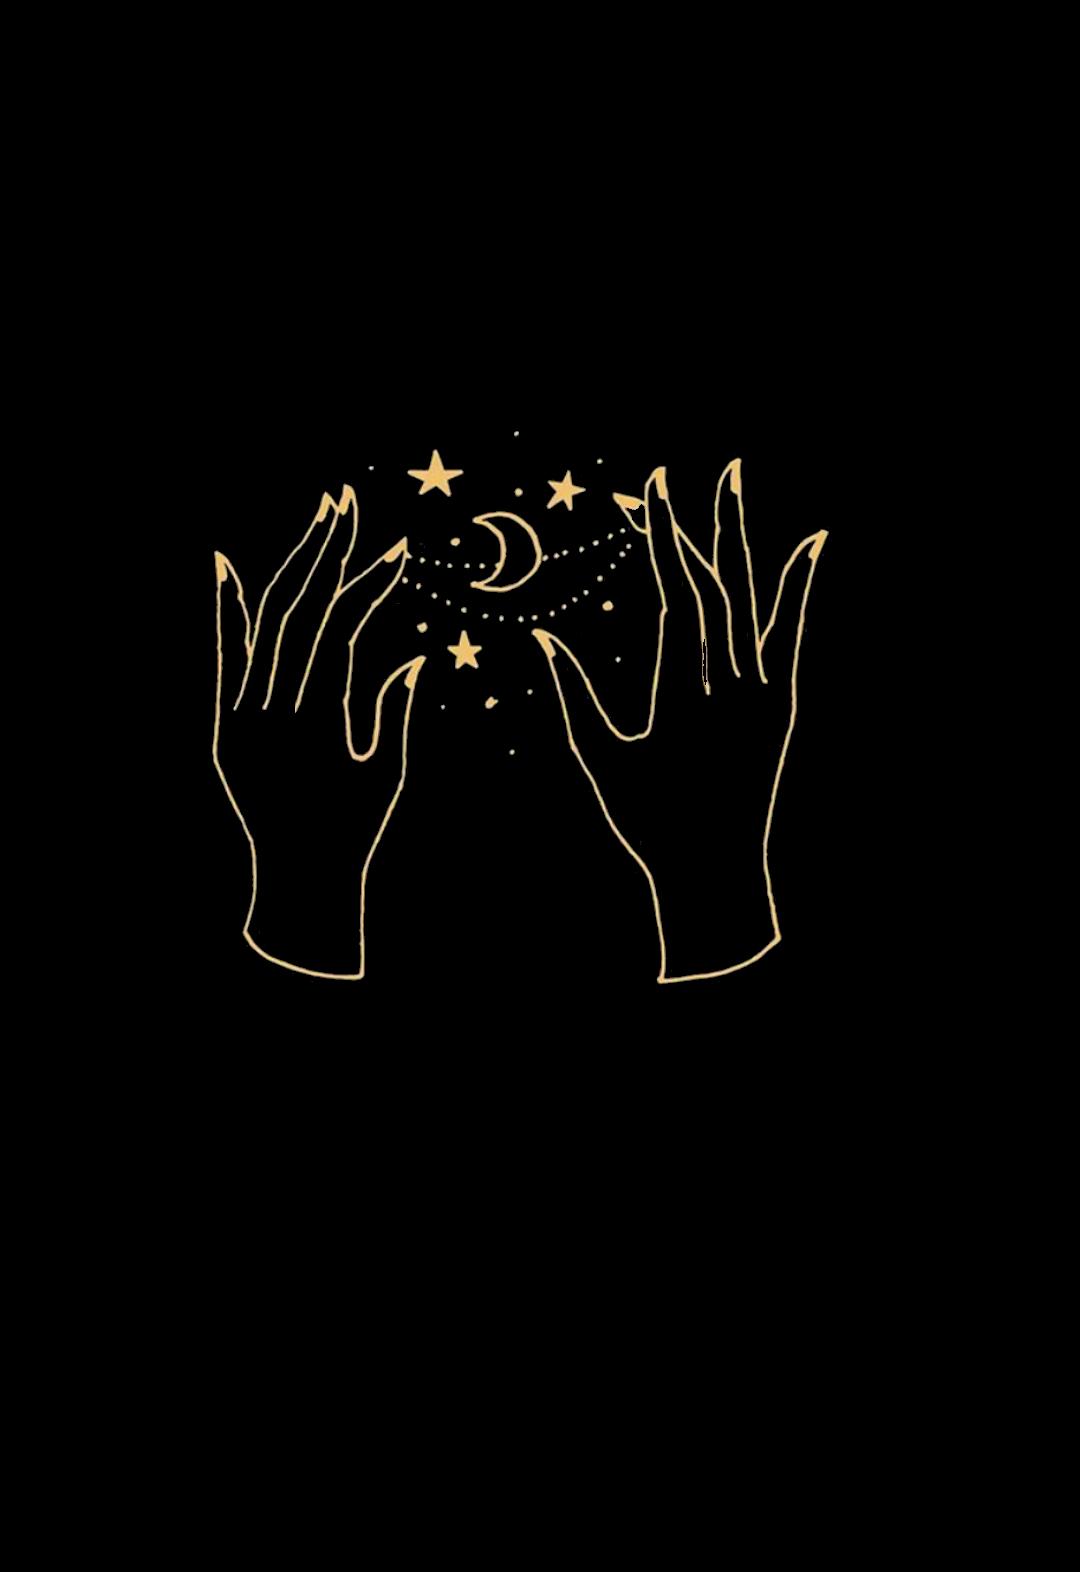 outline tumblr magic hands aesthetic